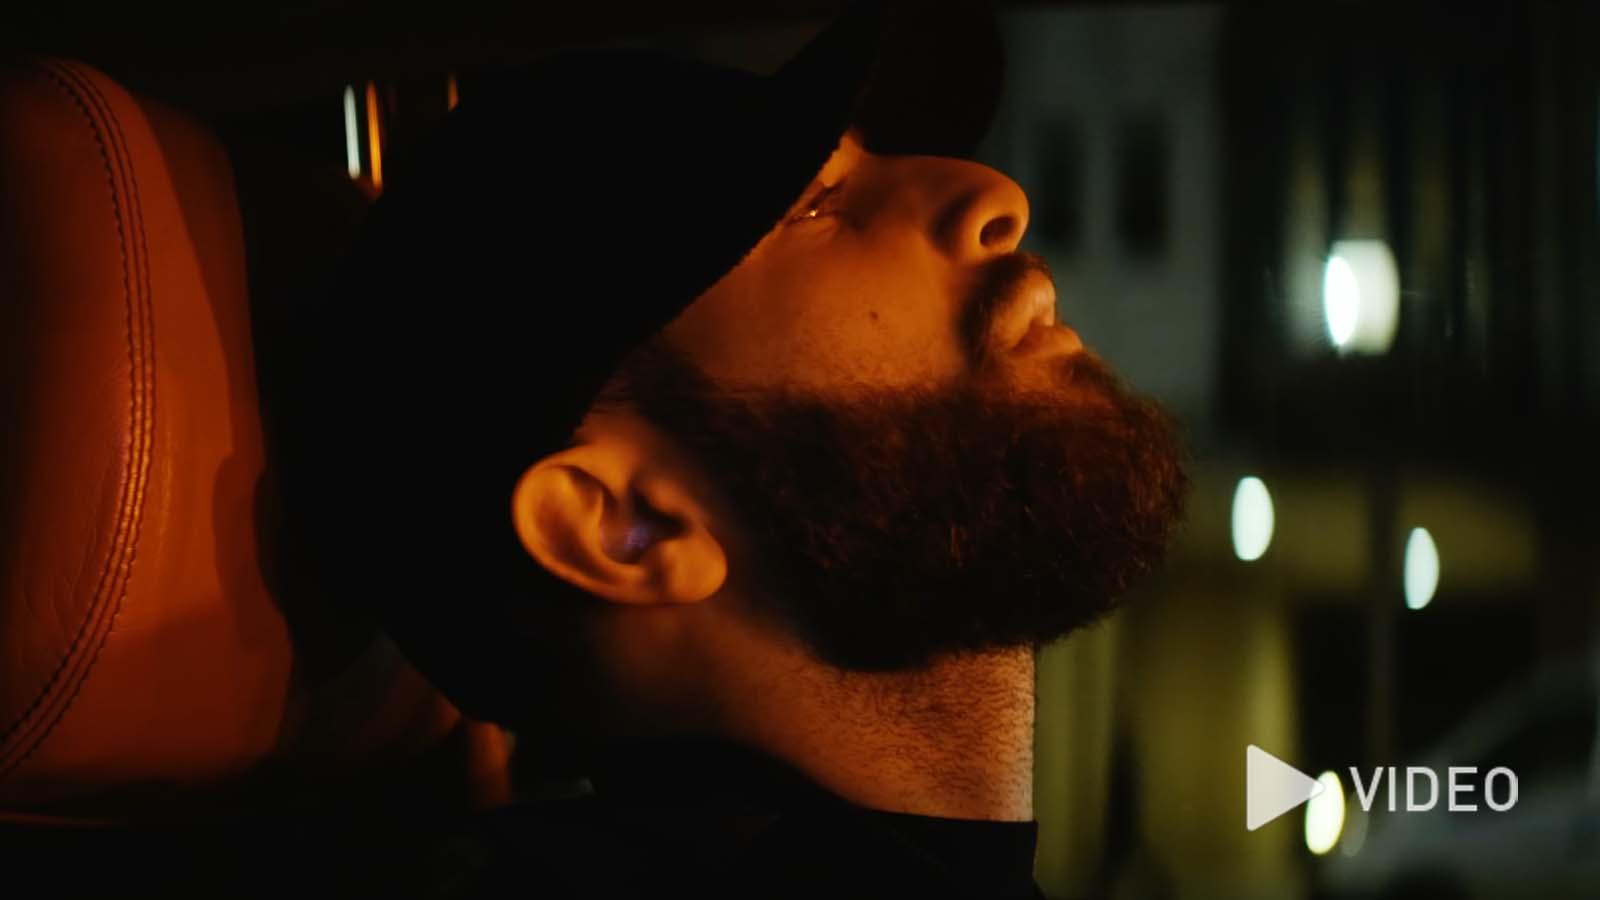 Nimo ft. Hava – Kein Schlaf [Video]